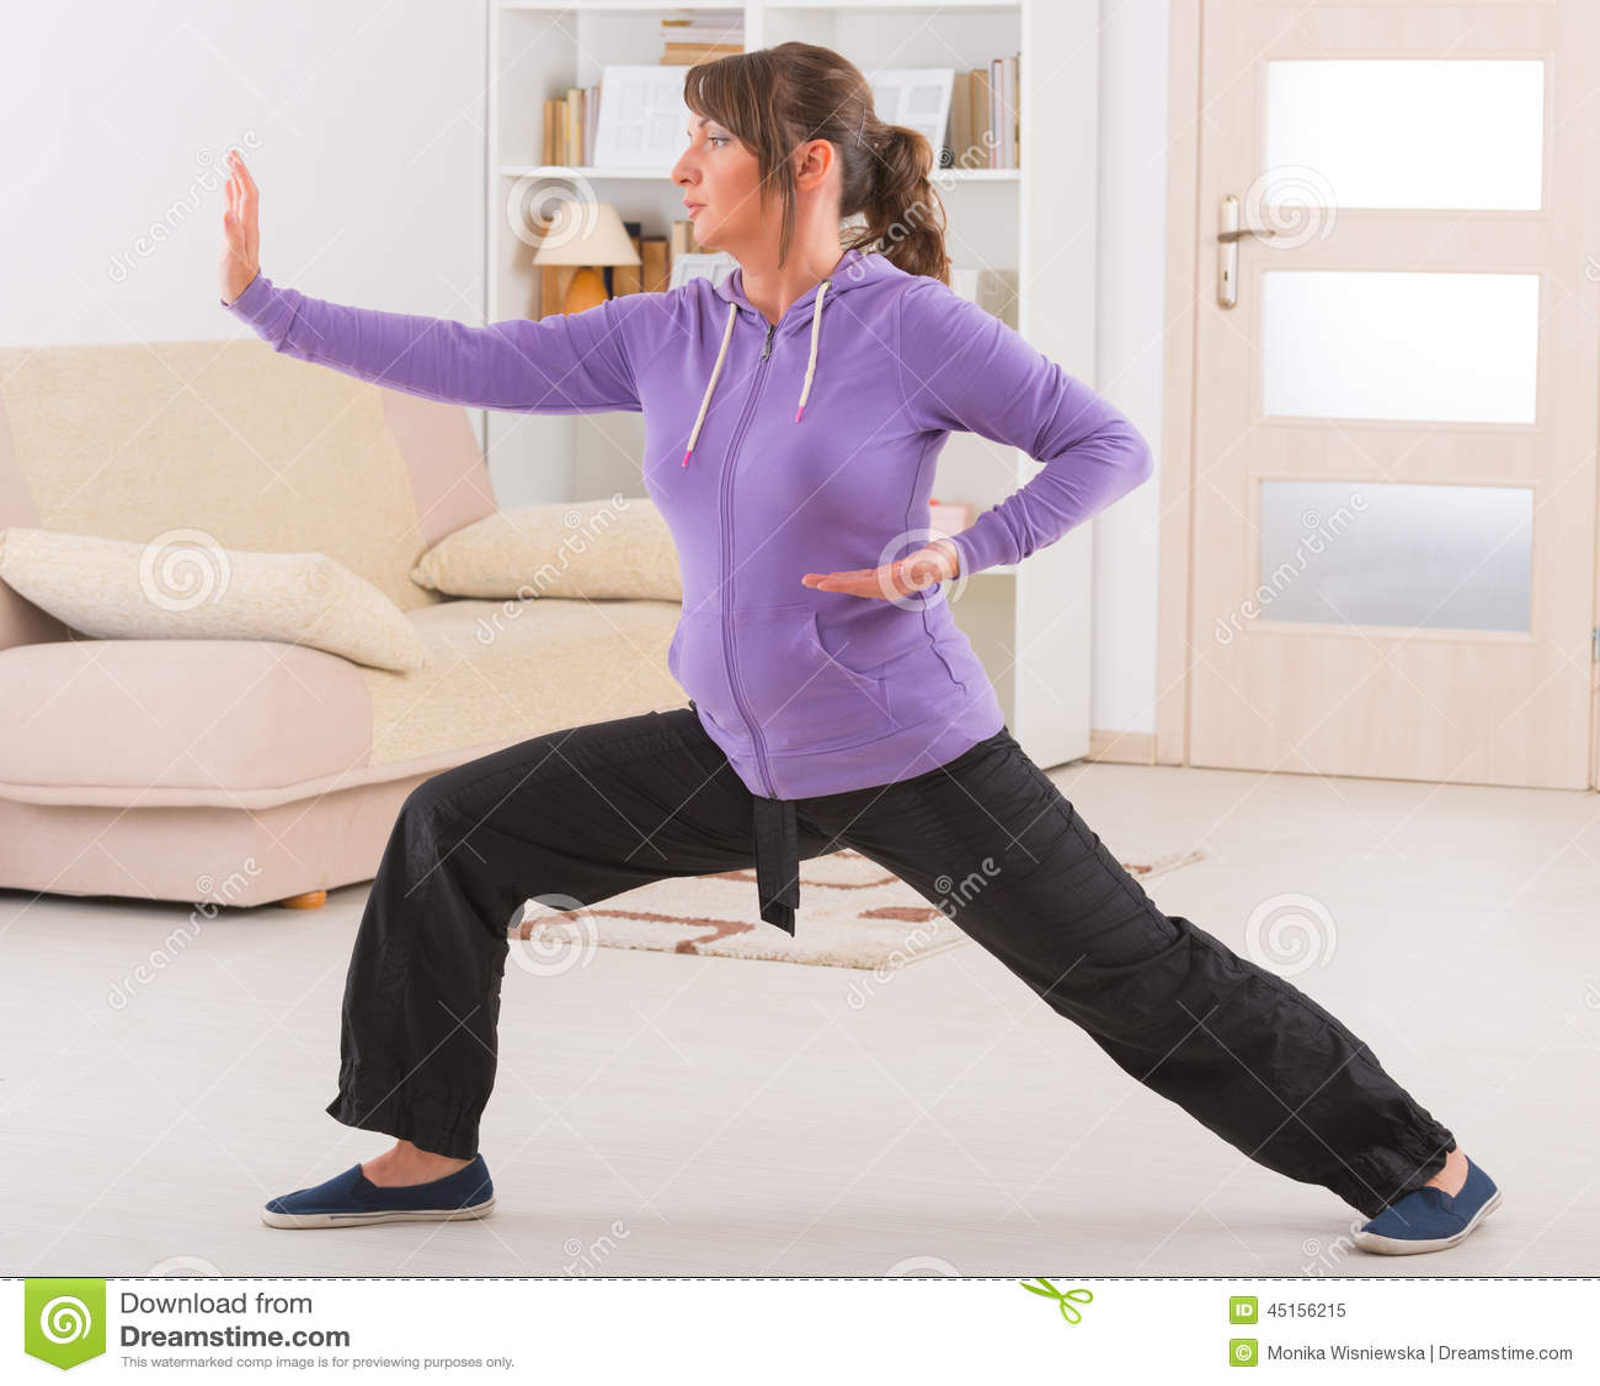 Woman Doing Qi Gong Tai Chi Exercise Stock Photo - Image: 45156215